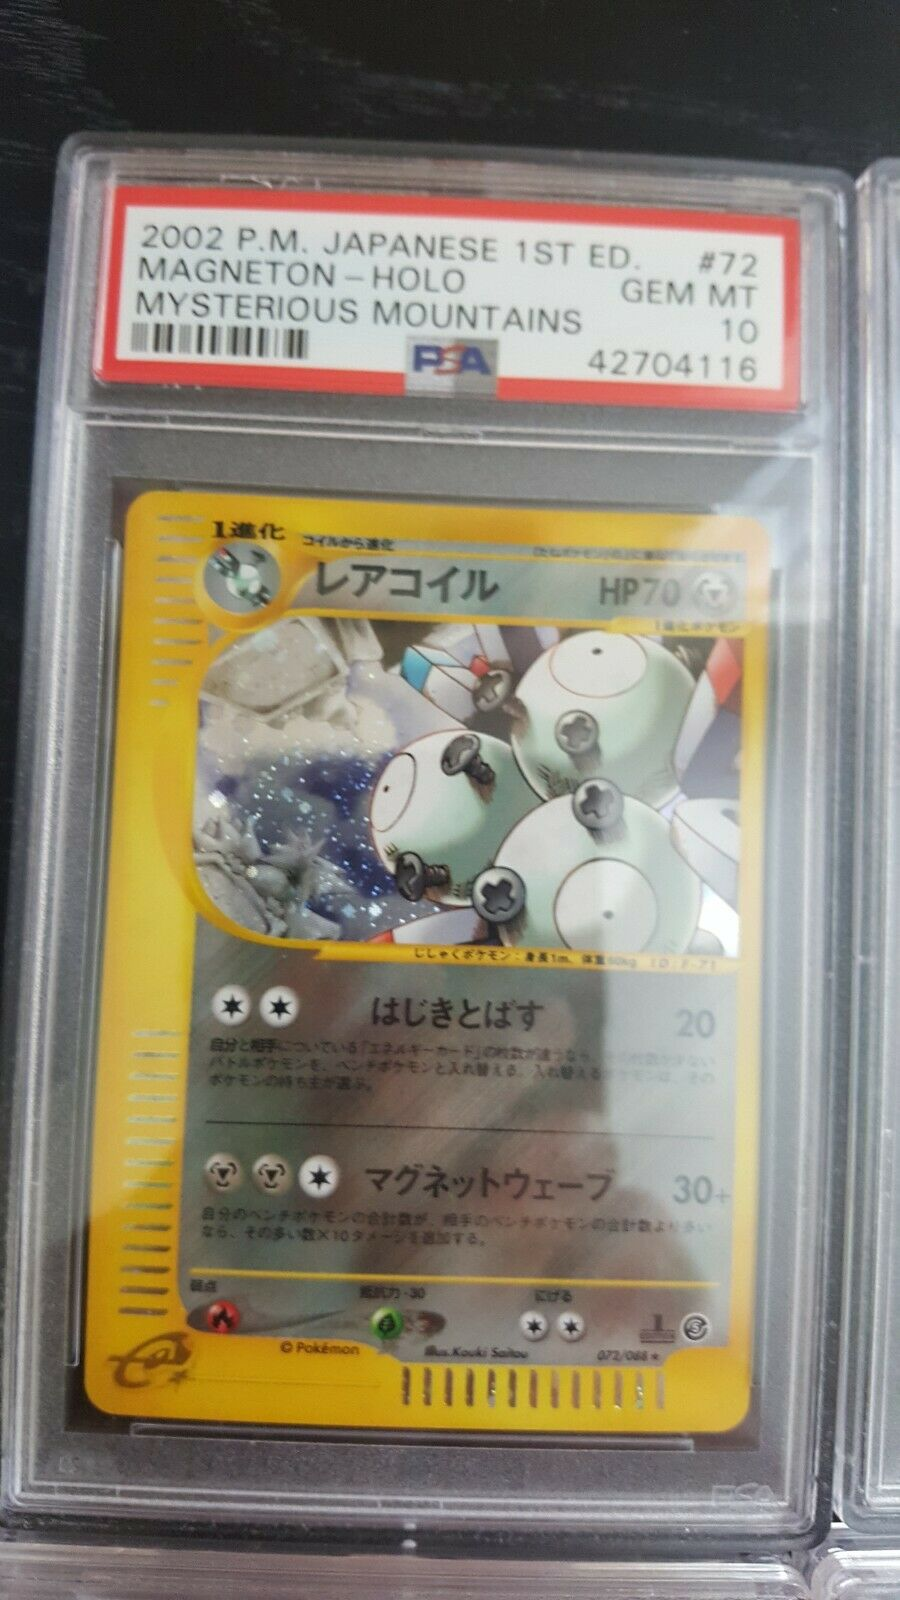 Pokemon card Japanese 1st Mysterious Mountains Magneton 072088 PSA 10 Gem Mint